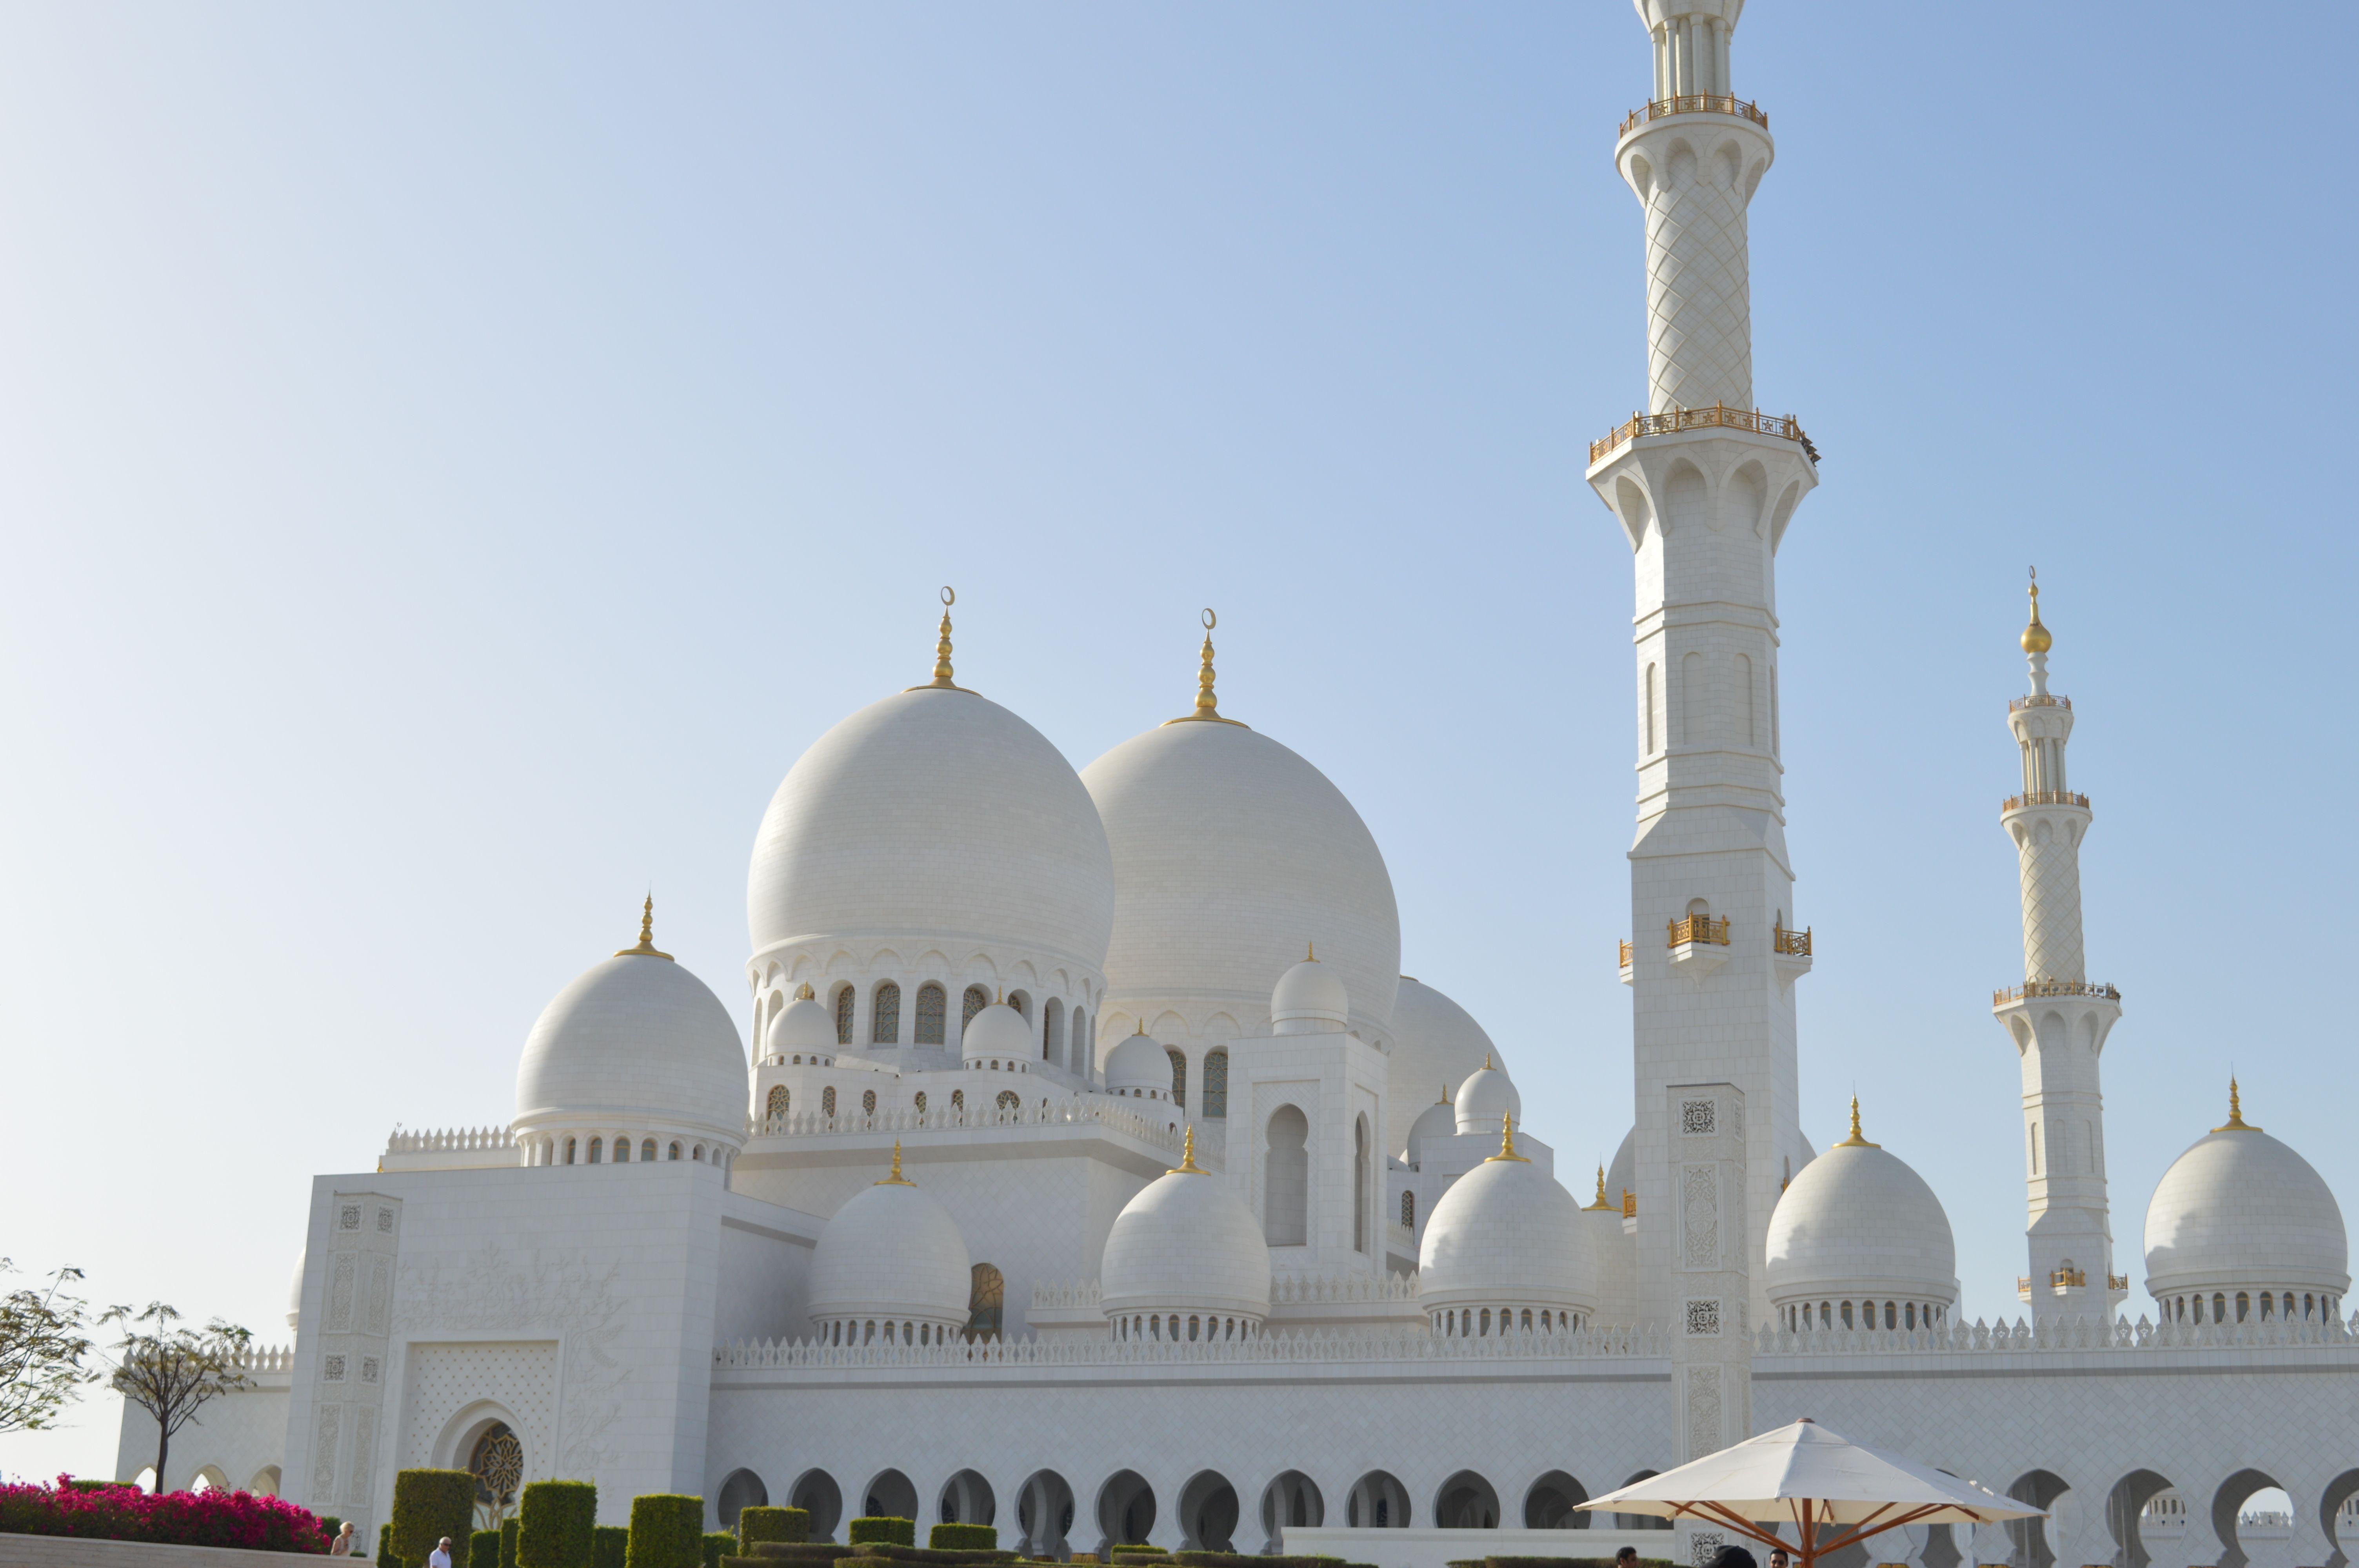 Abu Dhabi Dubai Travel Guide Dyandra Raye Dubai Travel Guide Dubai Travel Abu Dhabi Travel